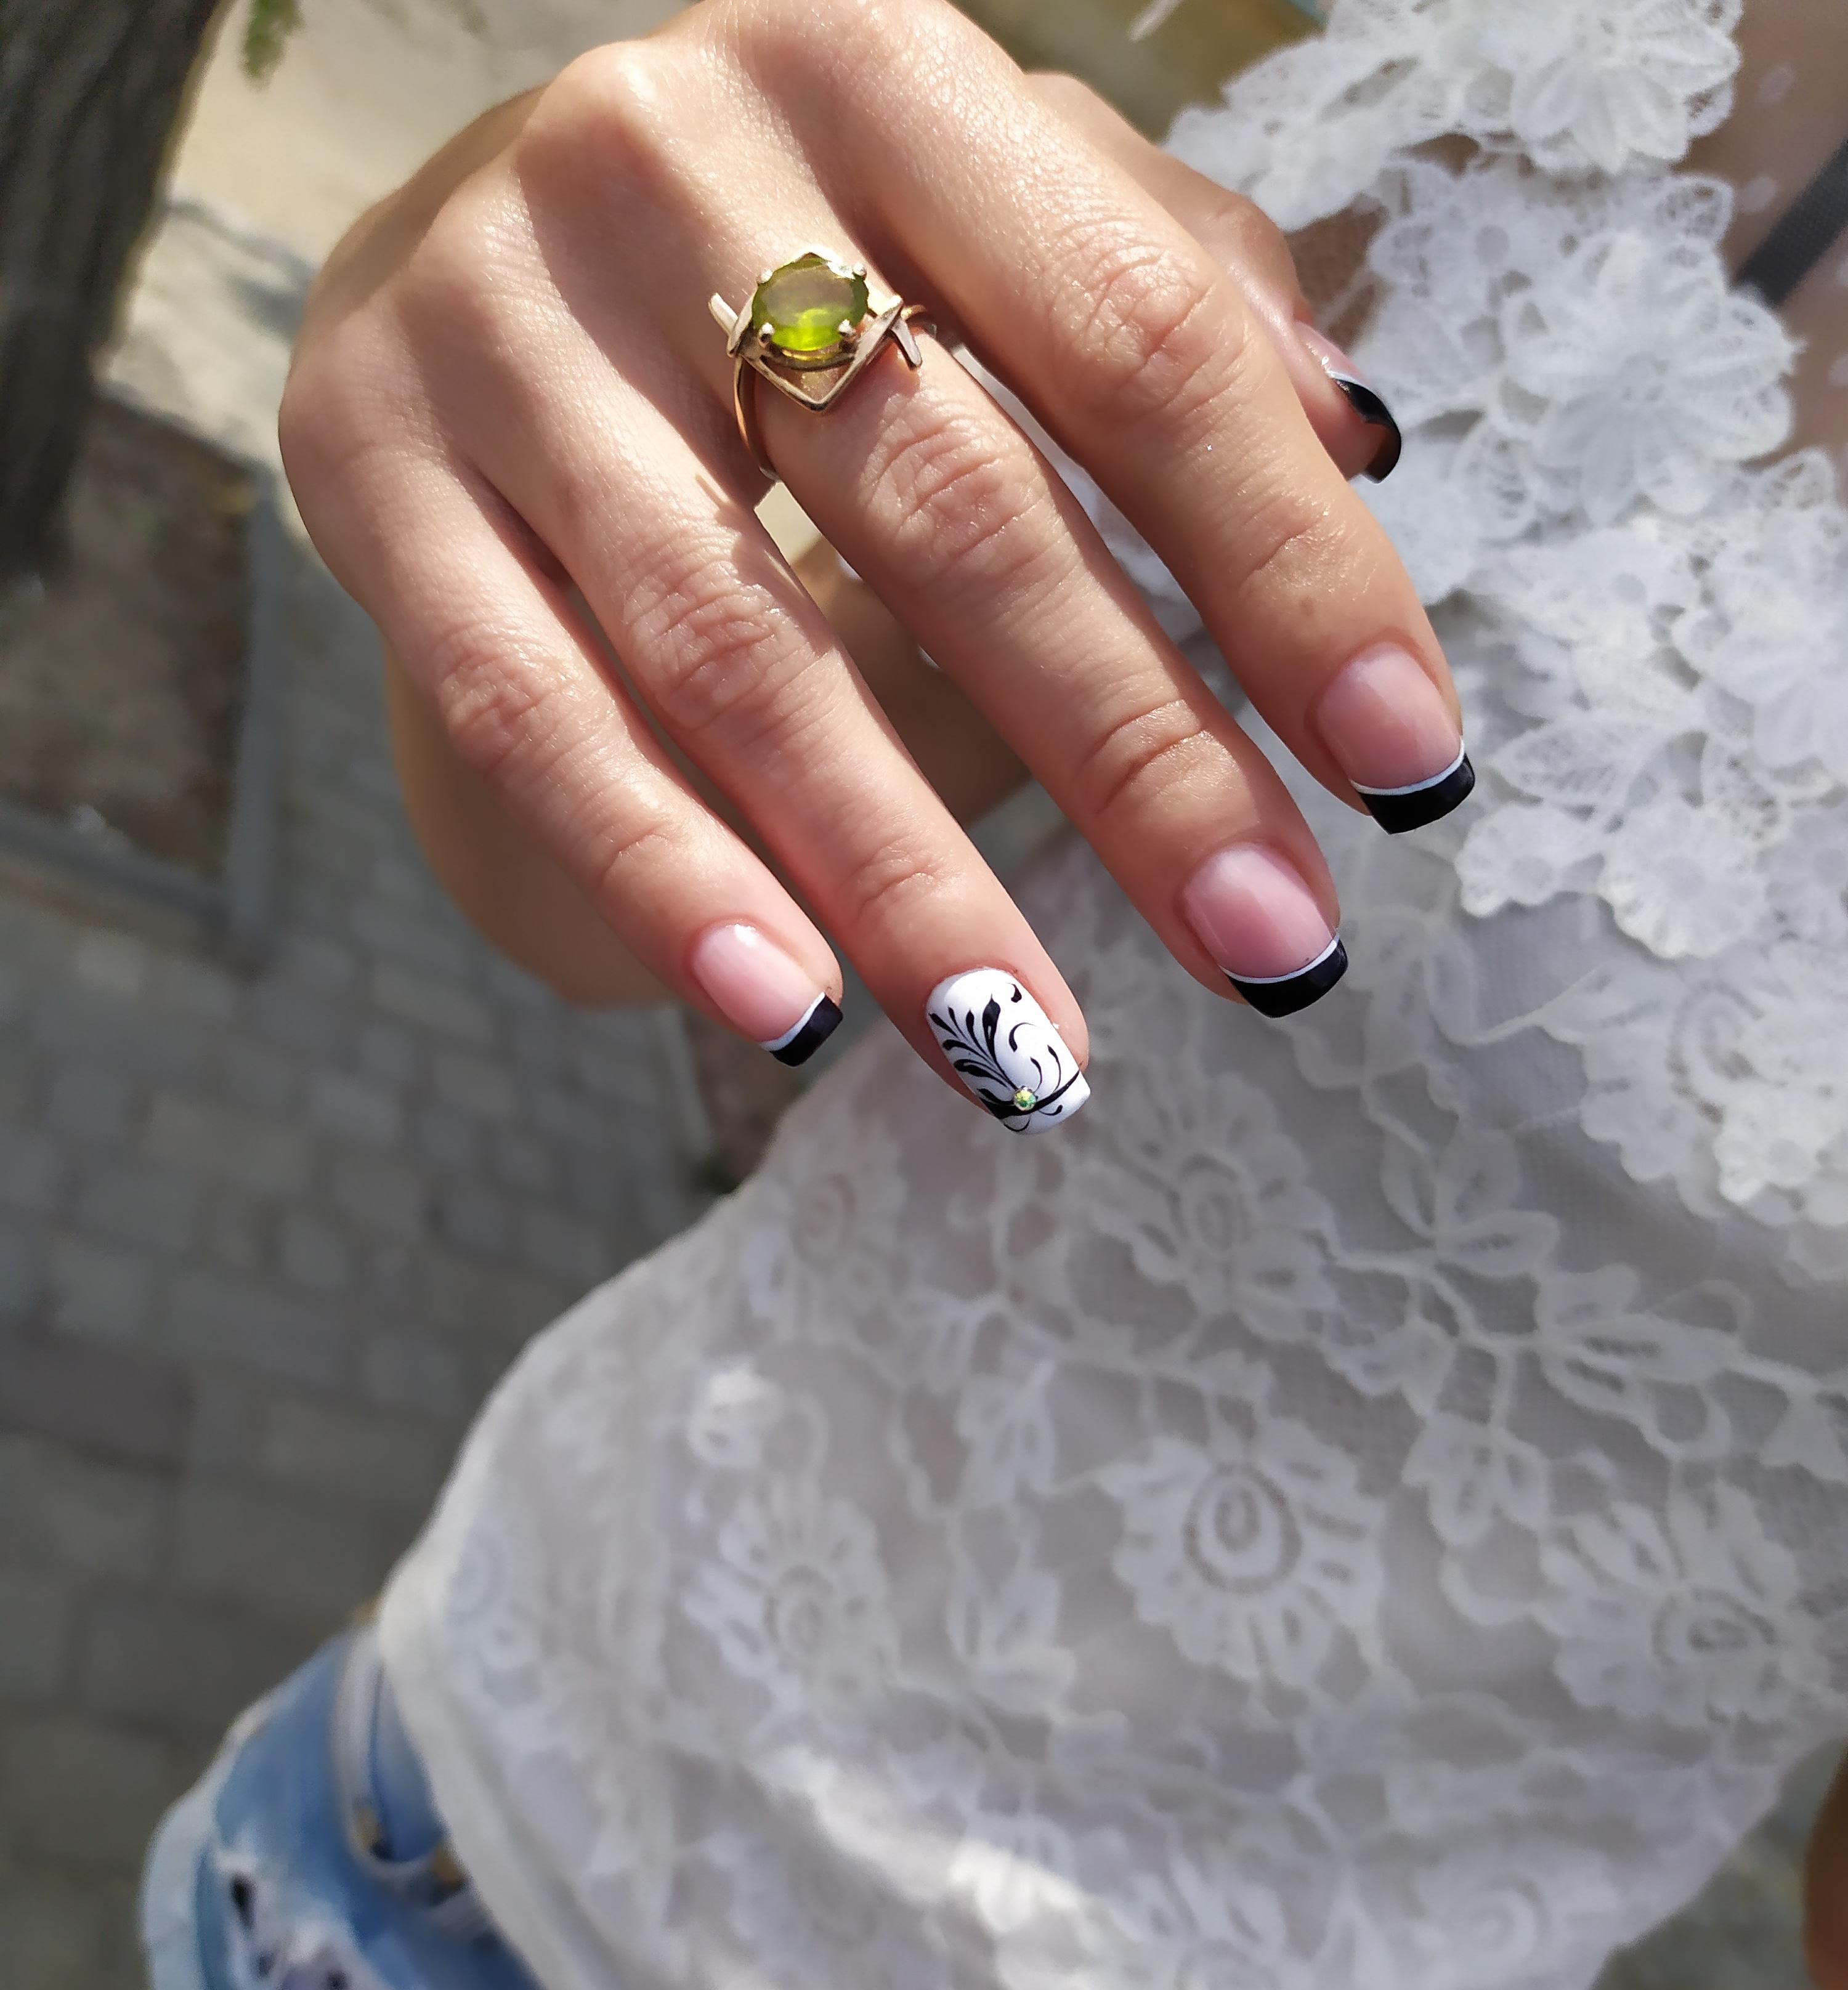 Френч с вензелями в черном цвете на короткие ногти.